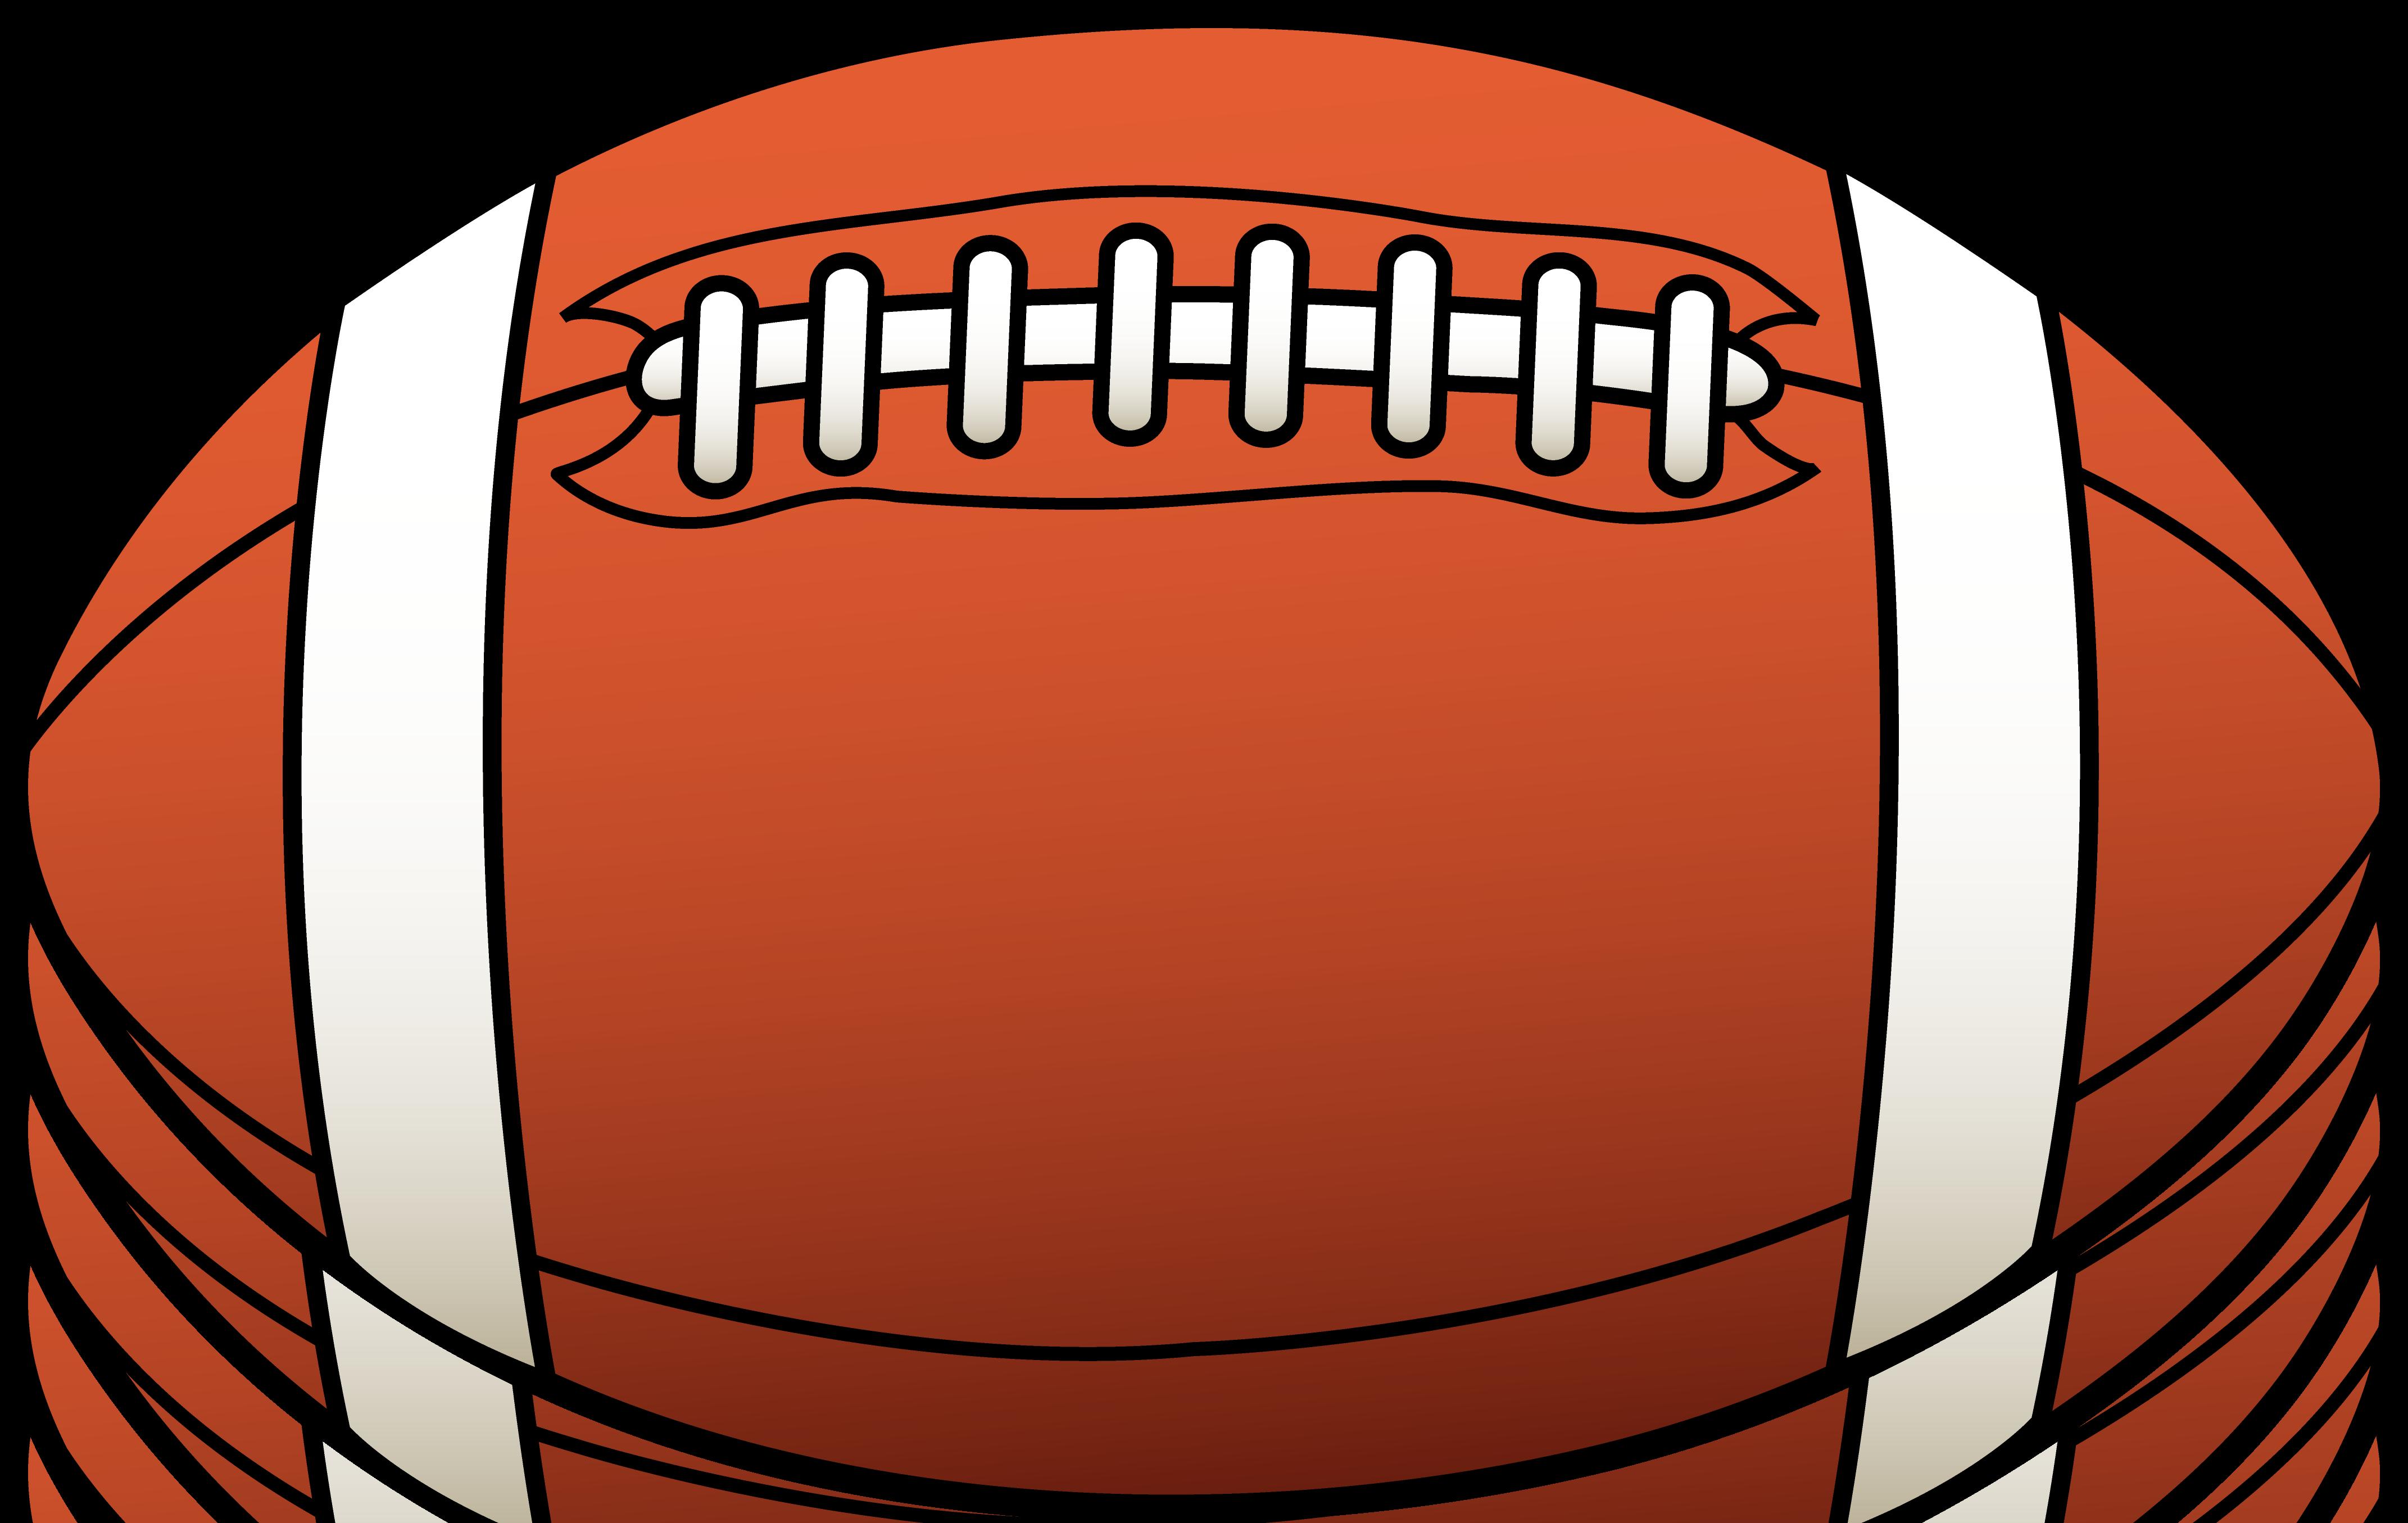 Football Clip Art u0026middot; football clipart